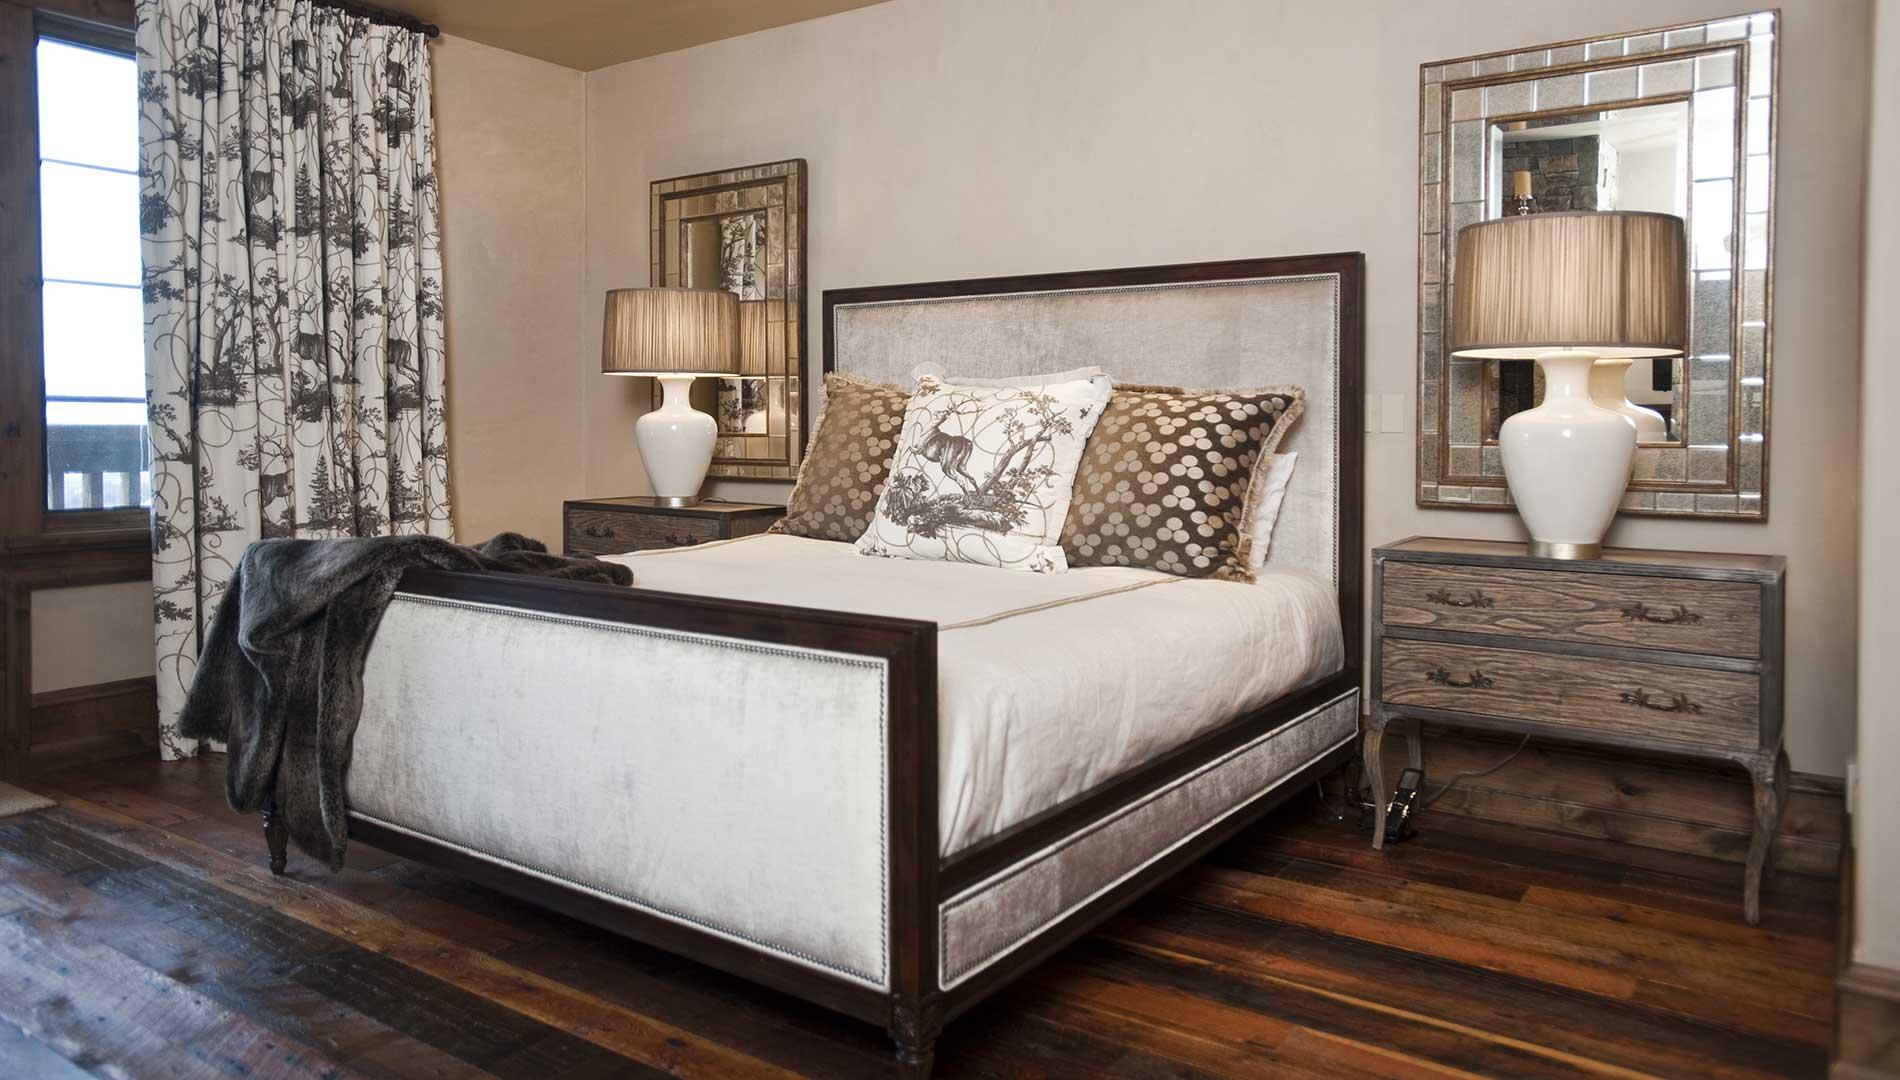 bedroom-yellowstone-club-elizabeth-robb-interiors-1900x1080